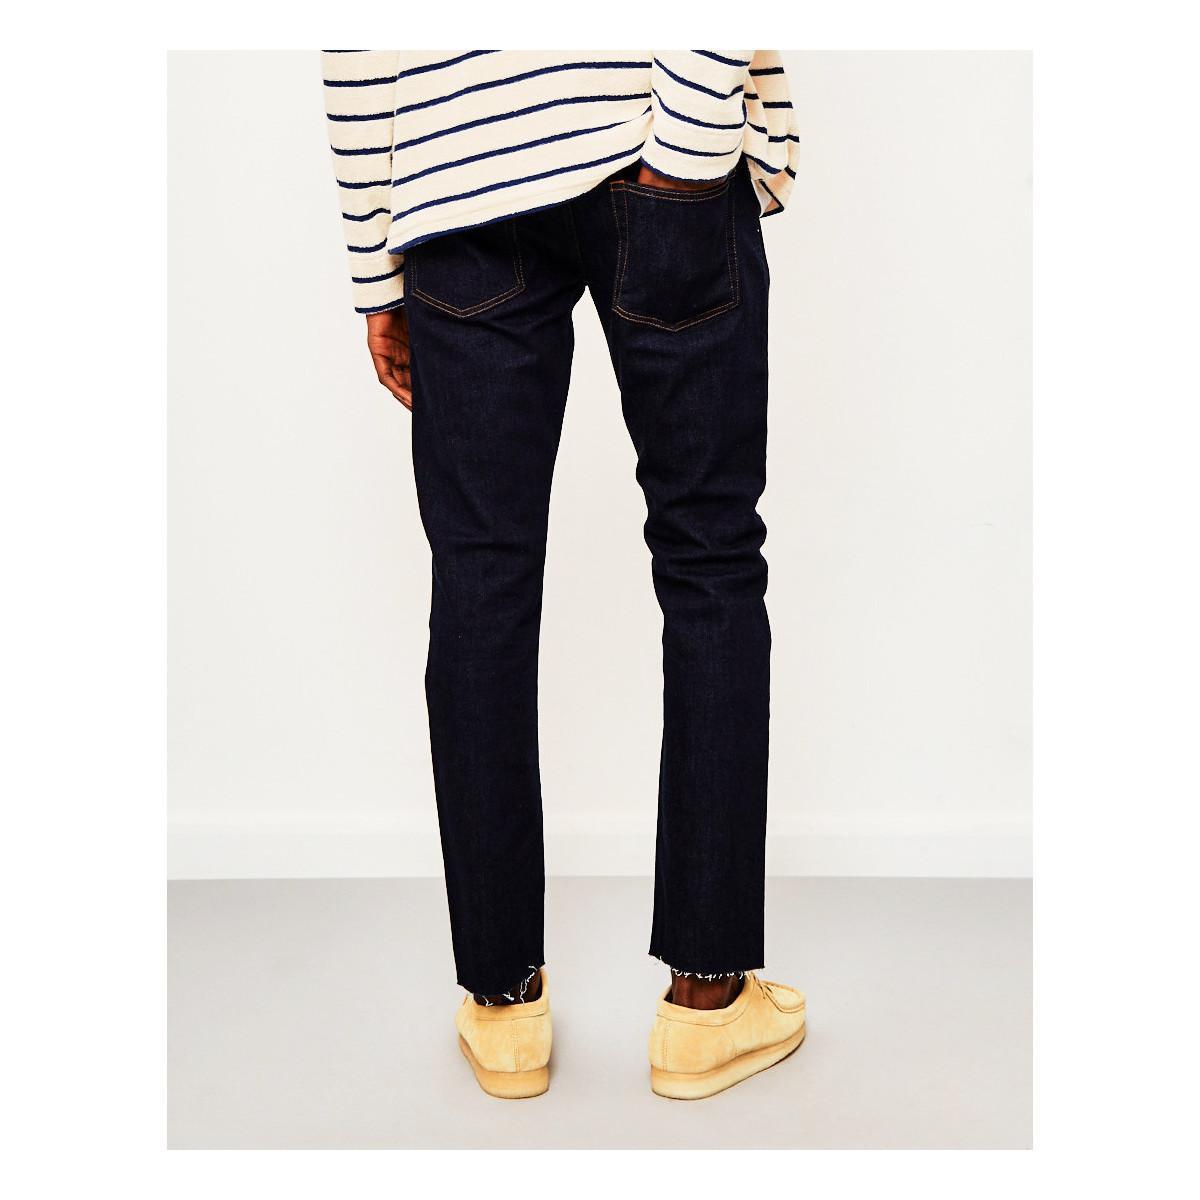 0d12c760f37 The Idle Man Slim Fit Raw Hem Jeans Rinse Wash raw Men s Jeans In ...